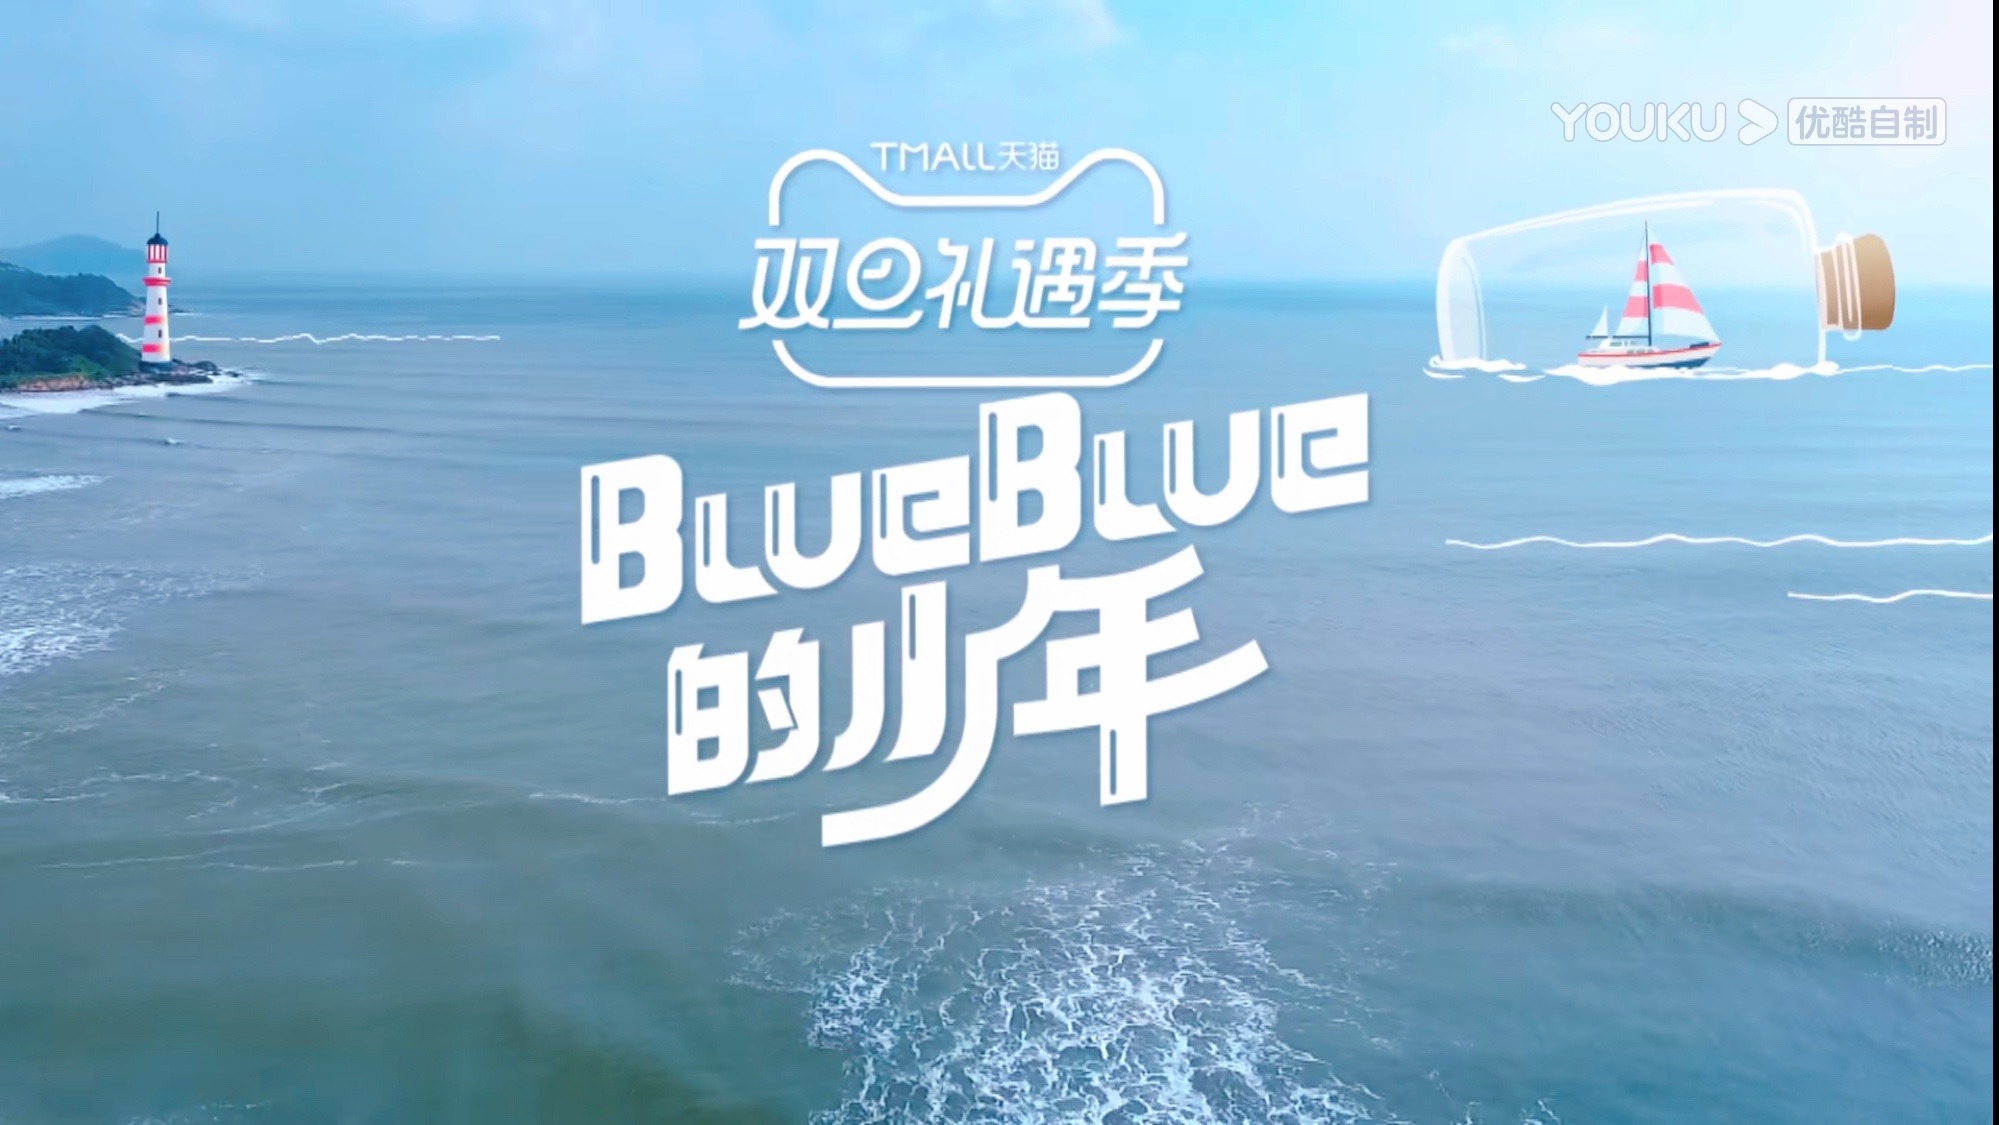 S.K.Y《blueblue的少年》李希侃学霸附体